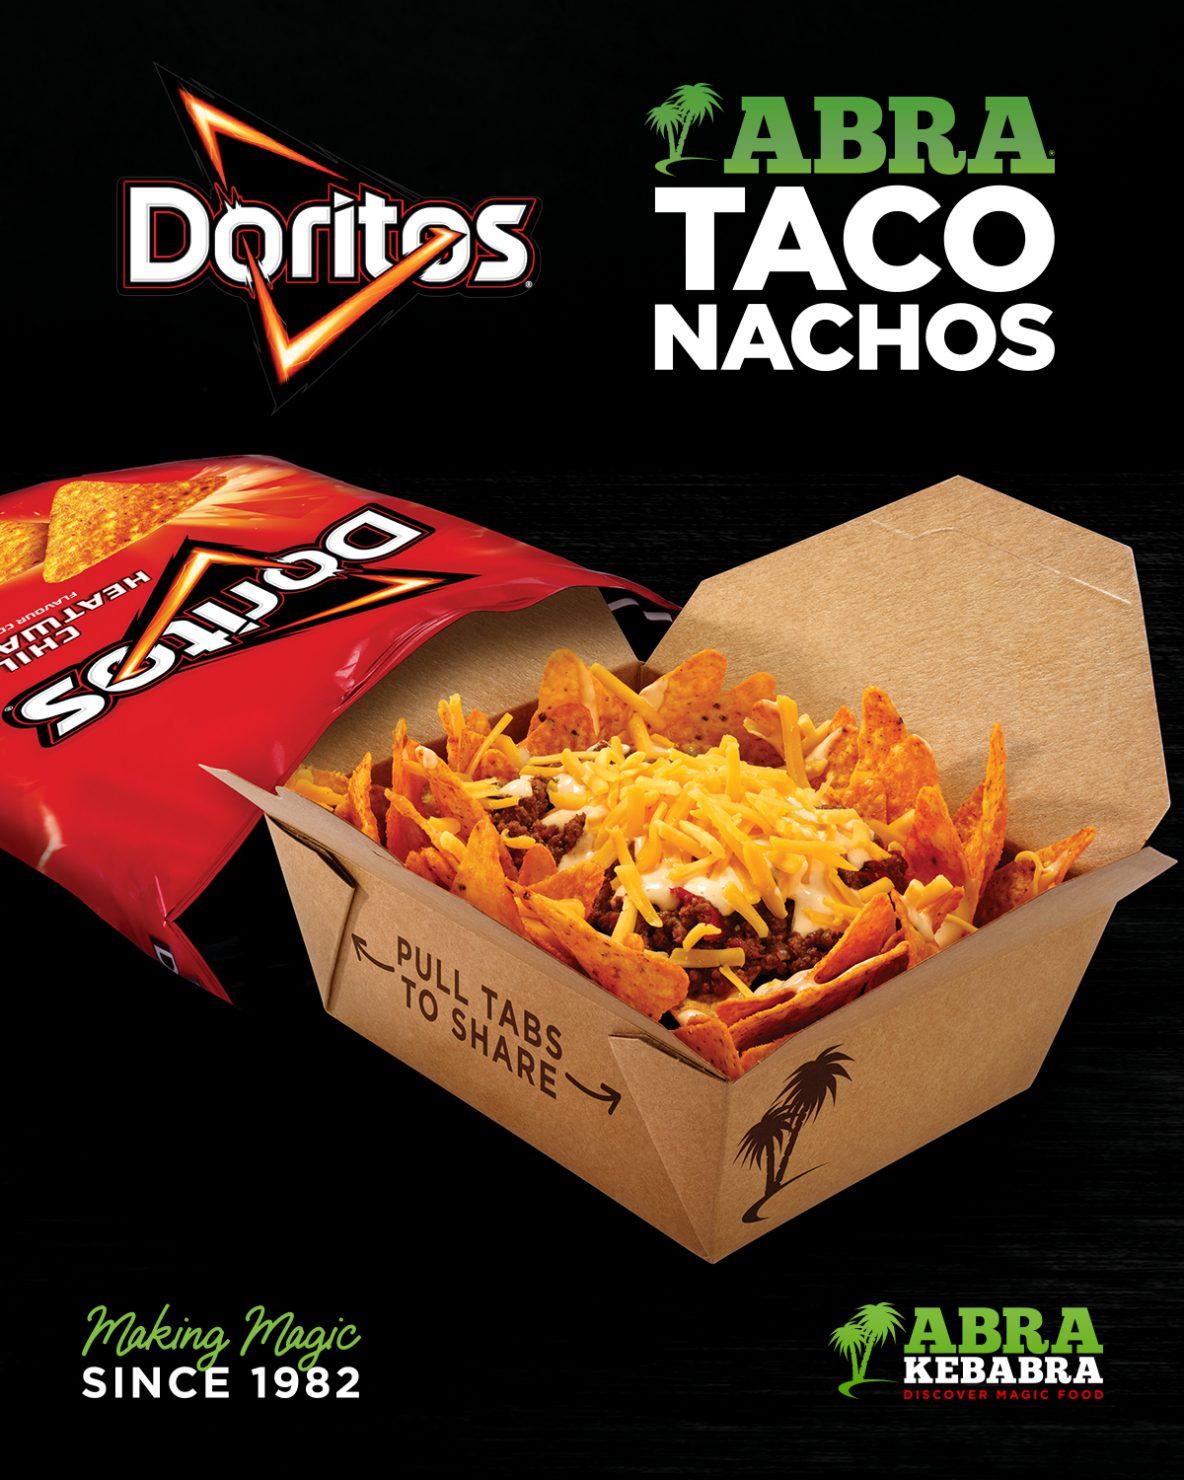 Doritos Abra Taco Nachos